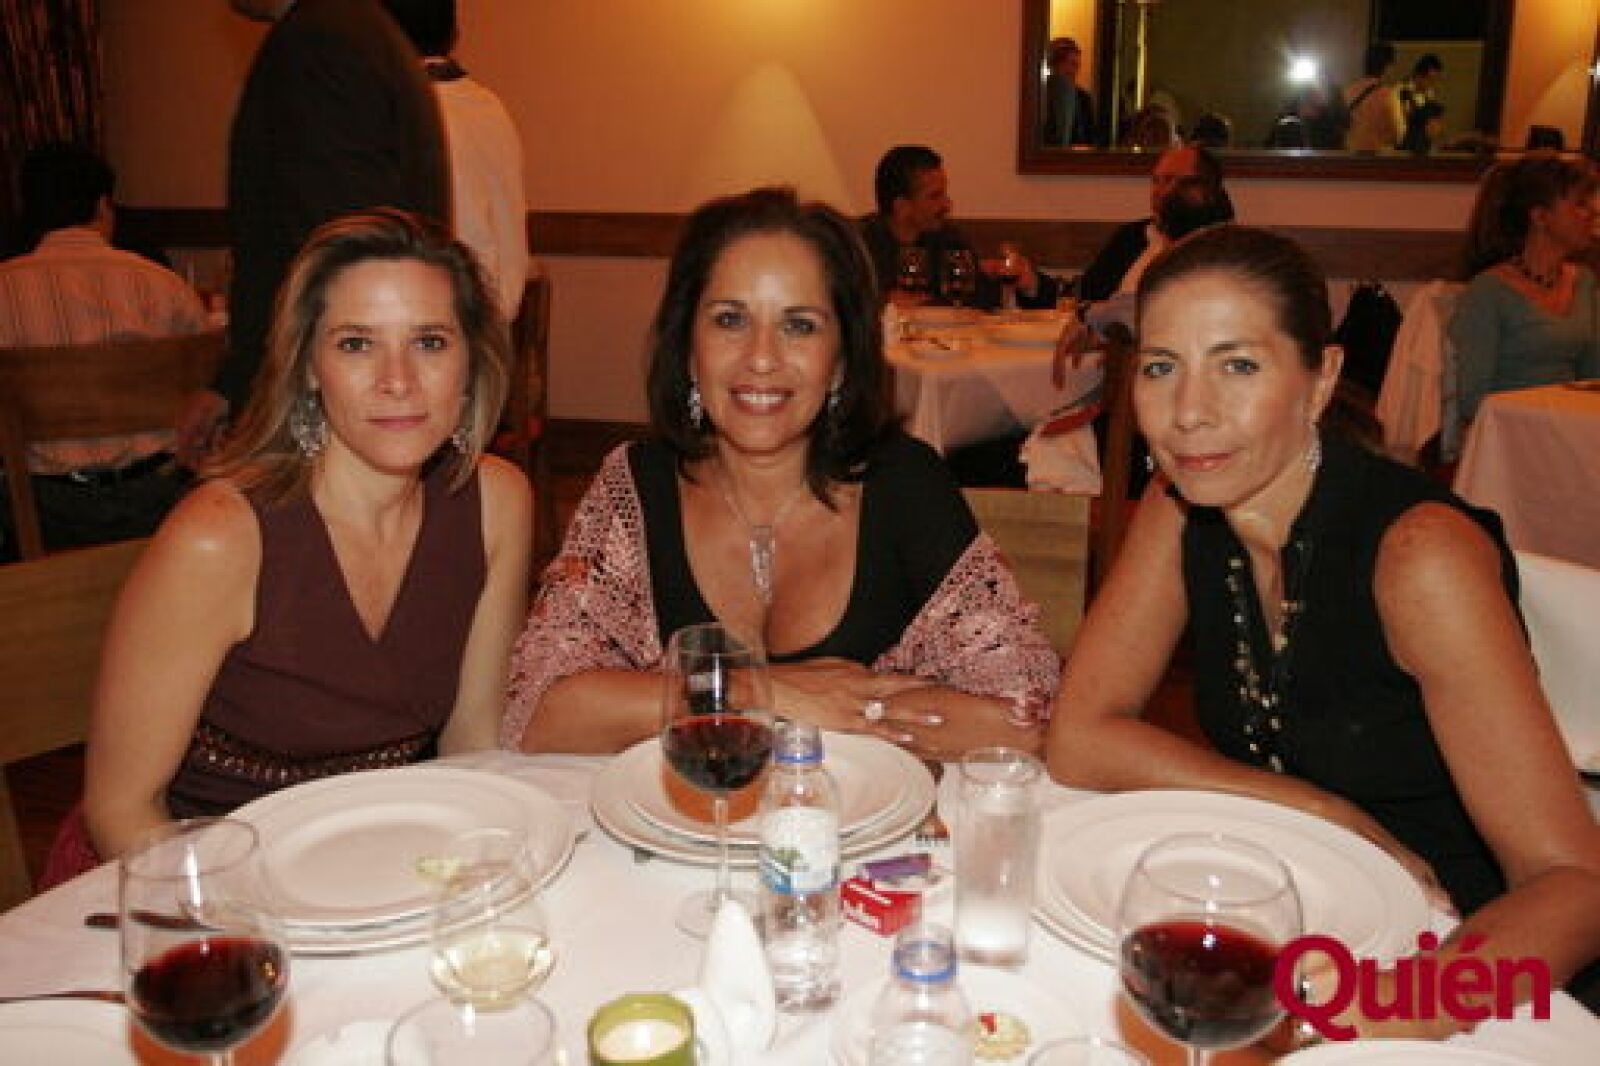 Dominique Berthelot, Mónica Marquiz, Blanche Toffel